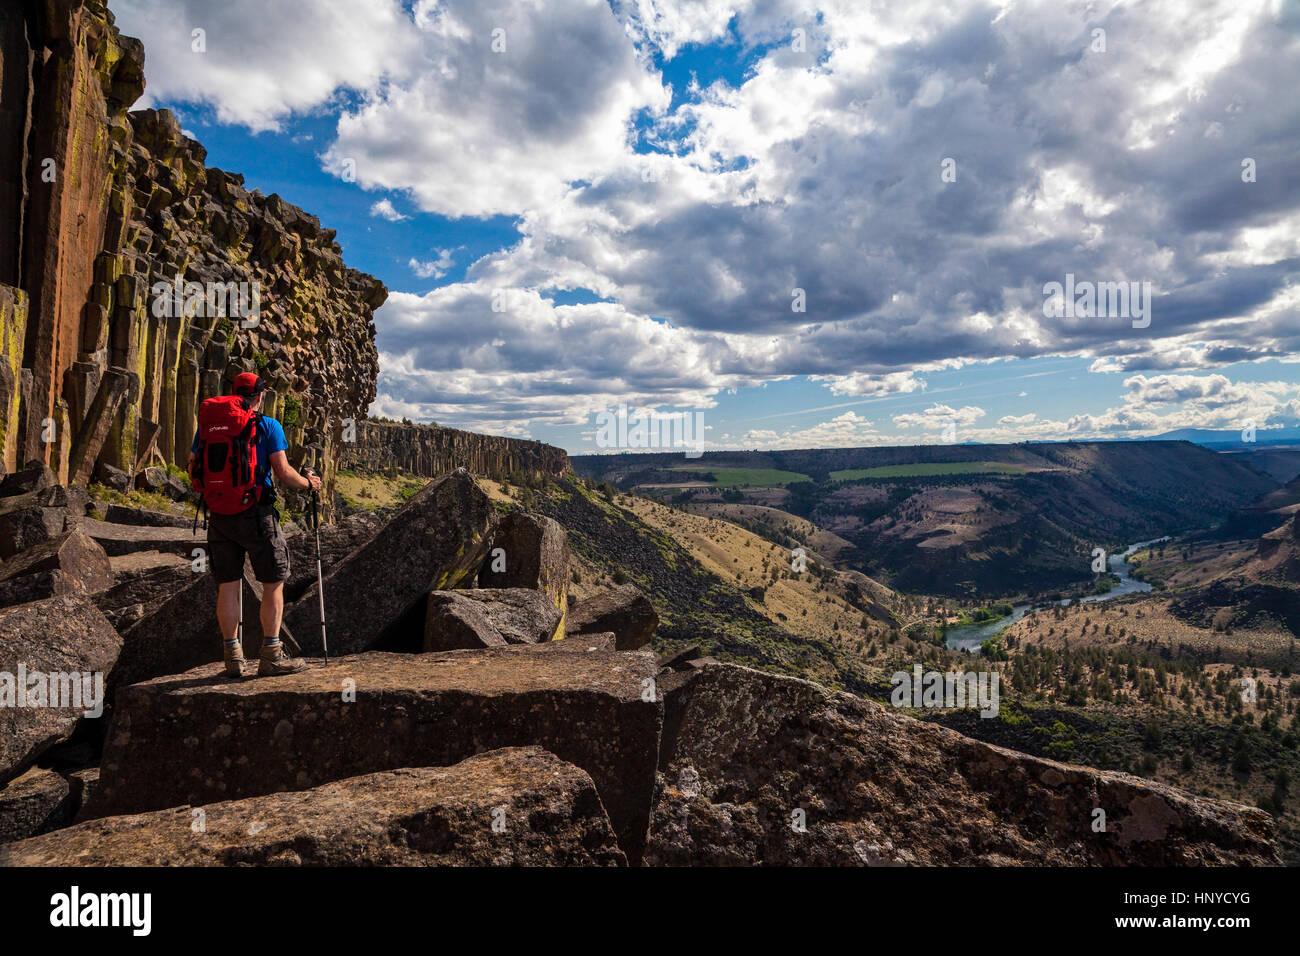 Hiker On Cliffs Above the Deschutes River Near Madras, Oregon - Stock Image